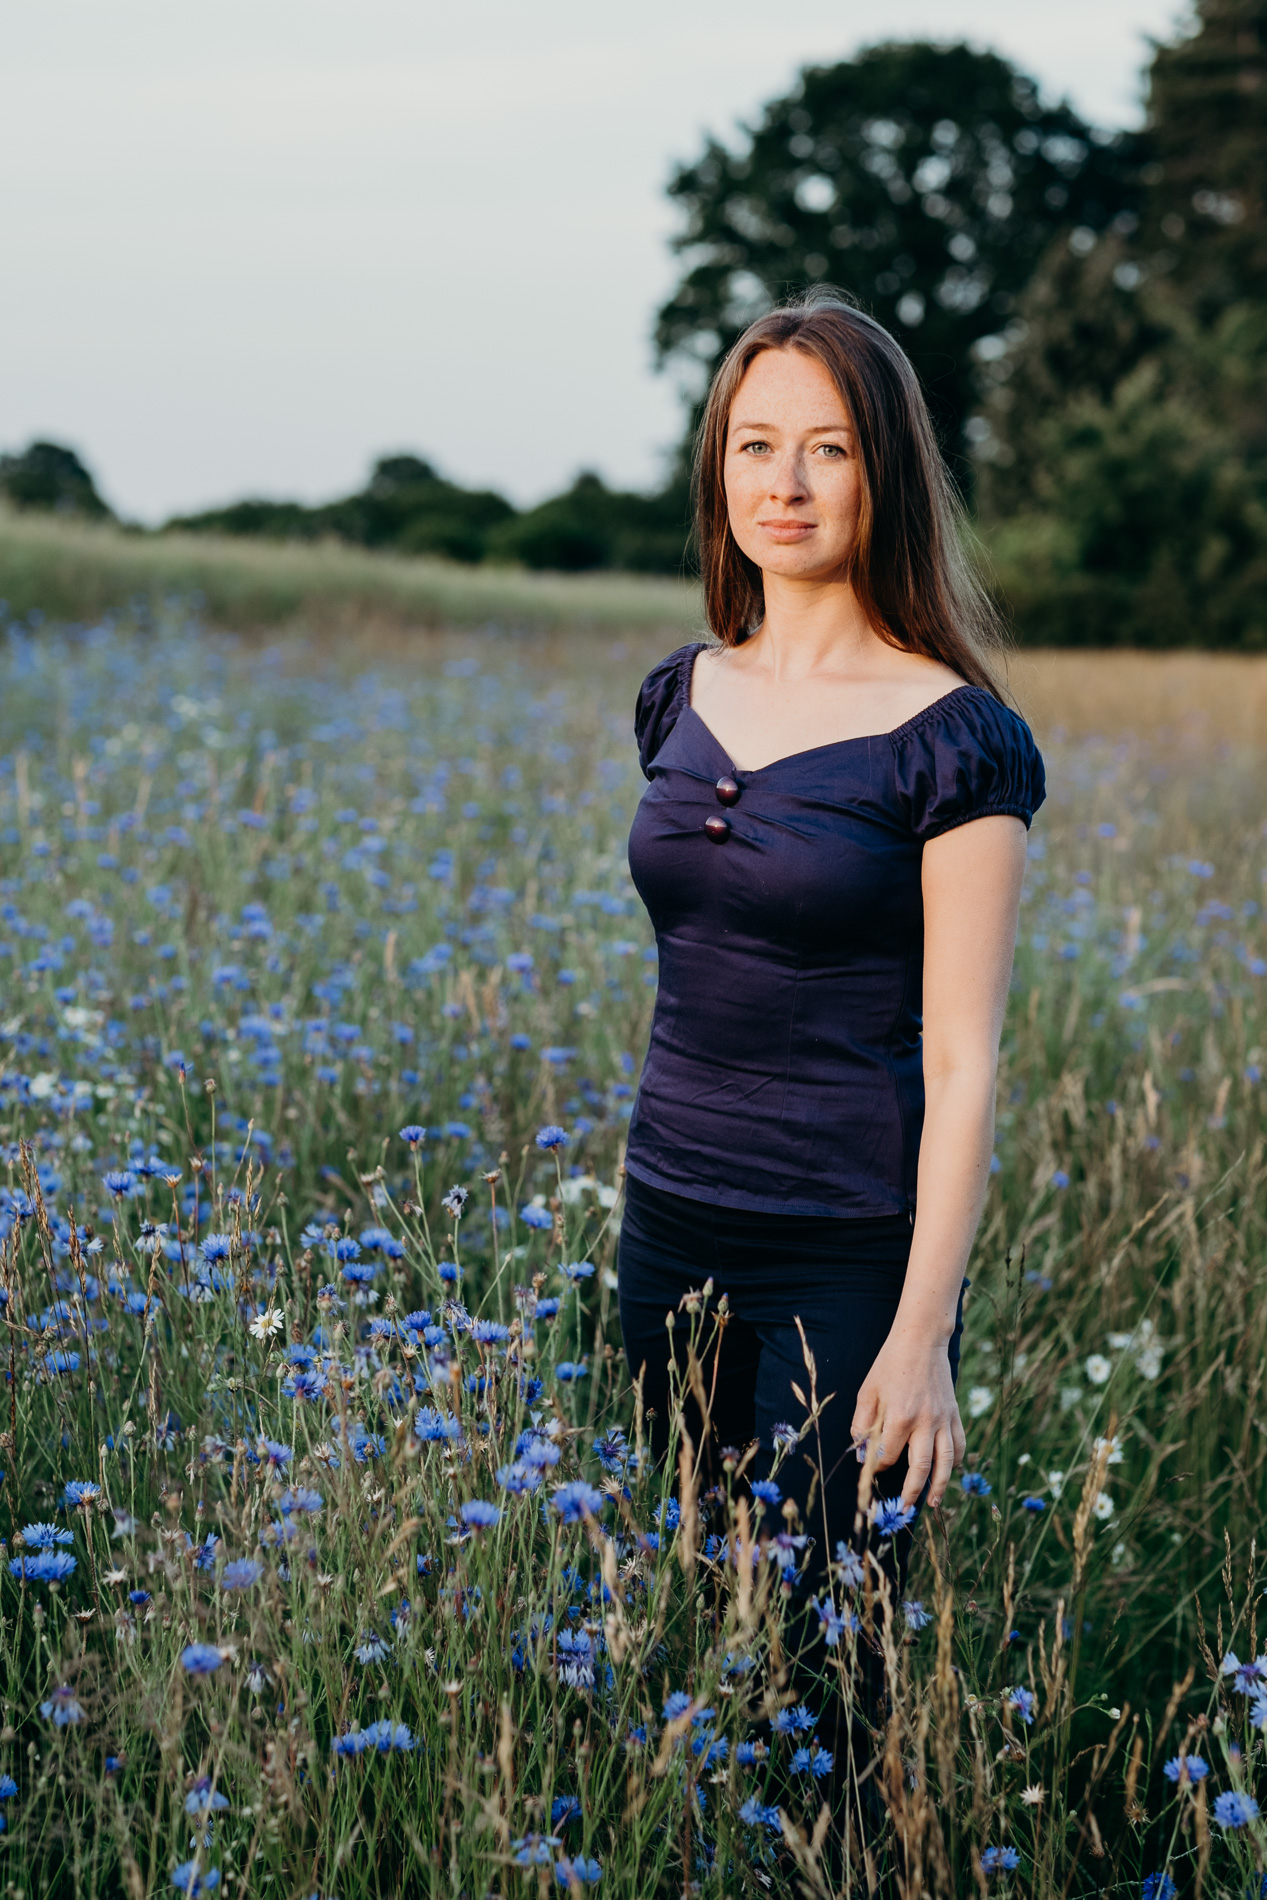 sistart-portrait-sommer-kornblumen-fotografin-fotograf-hamburg-ahrensburg-ammersbek-porträt